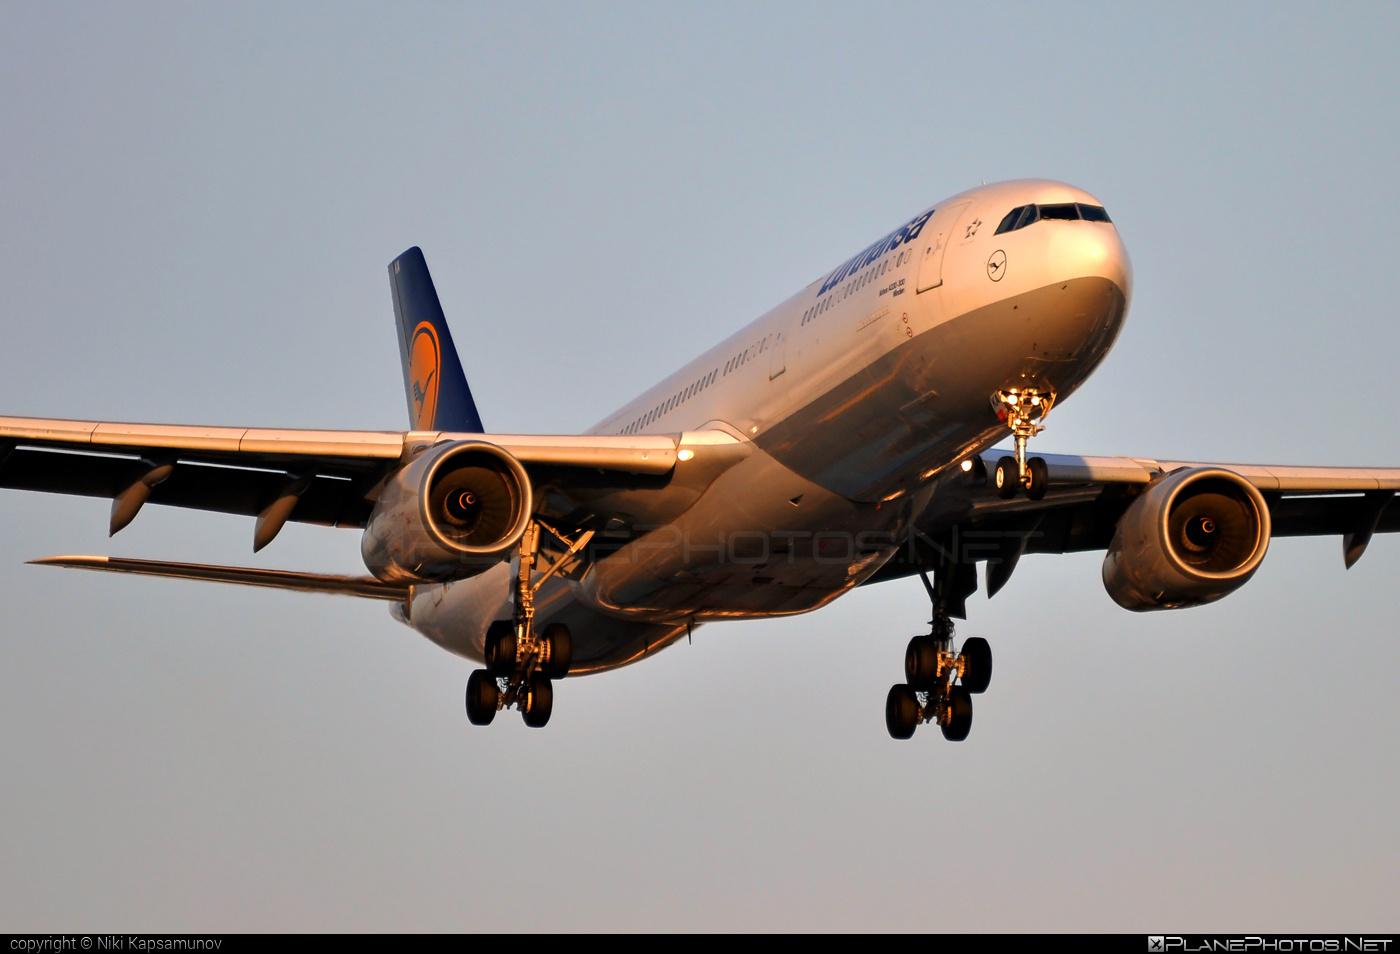 Airbus A330-343 - D-AIKA operated by Lufthansa #a330 #a330family #airbus #airbus330 #lufthansa